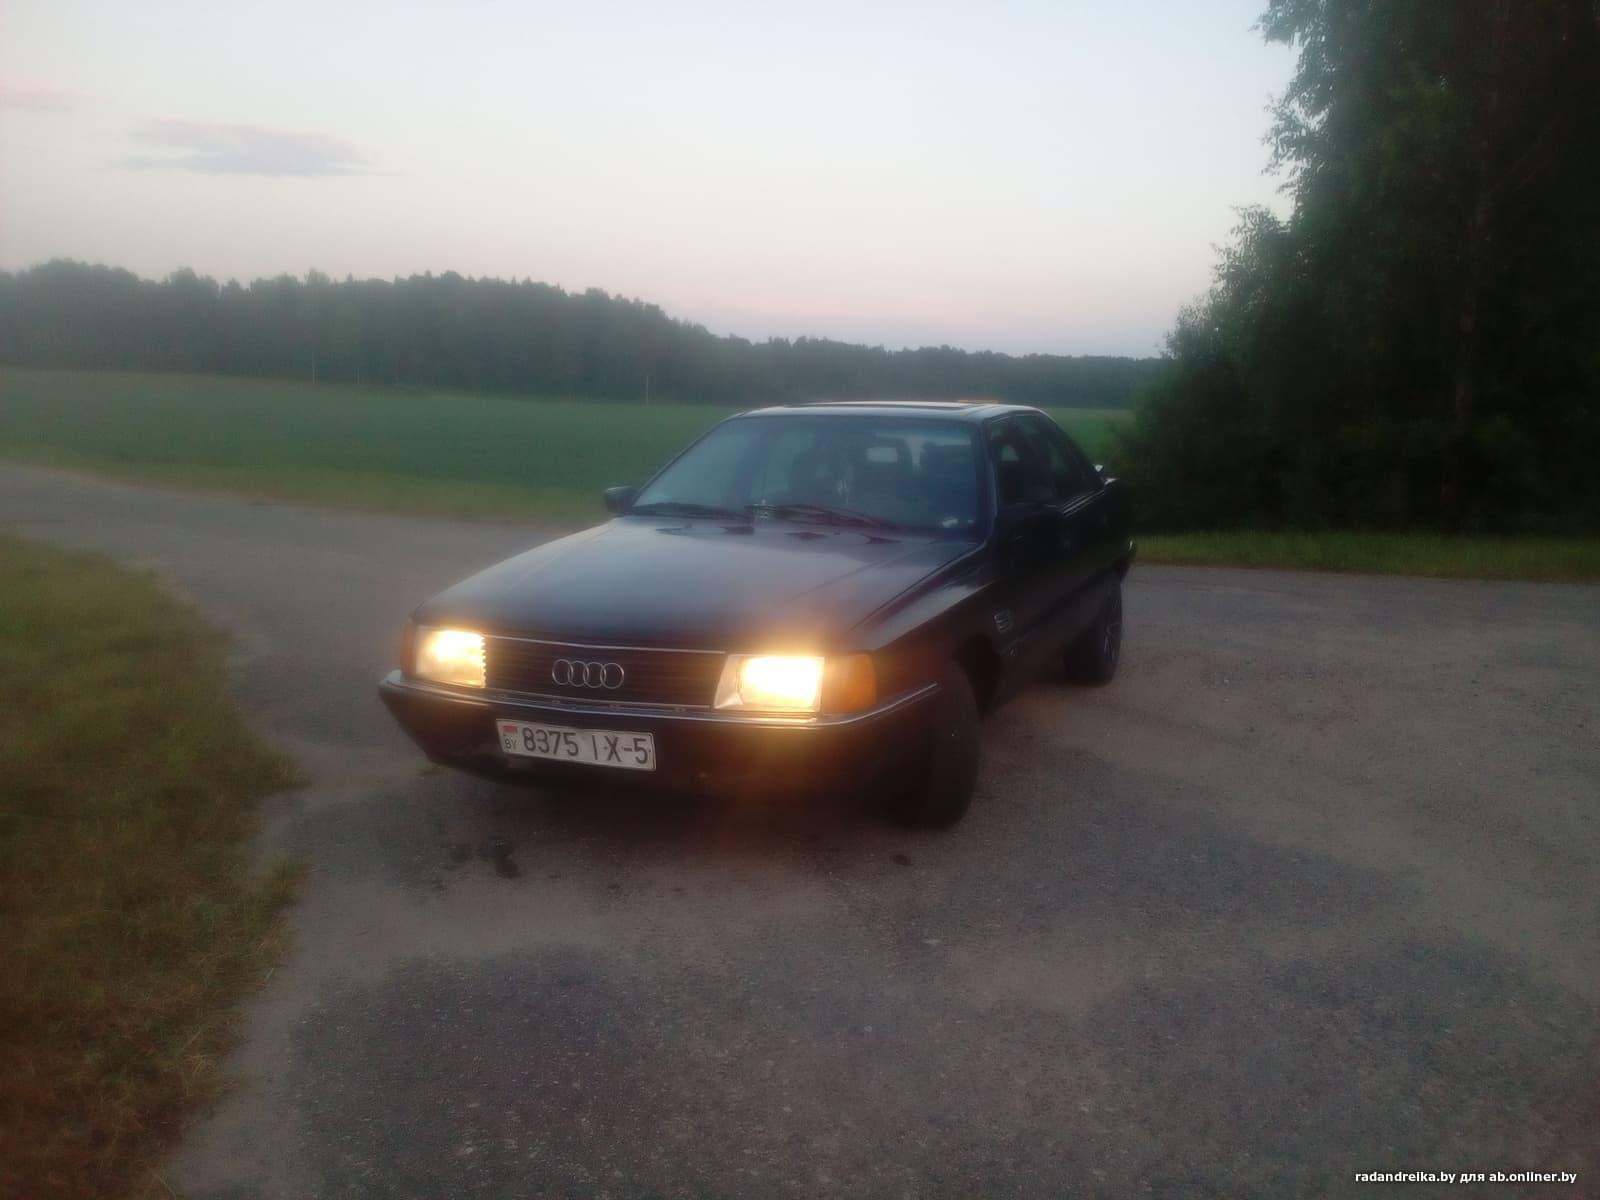 Audi 100 D